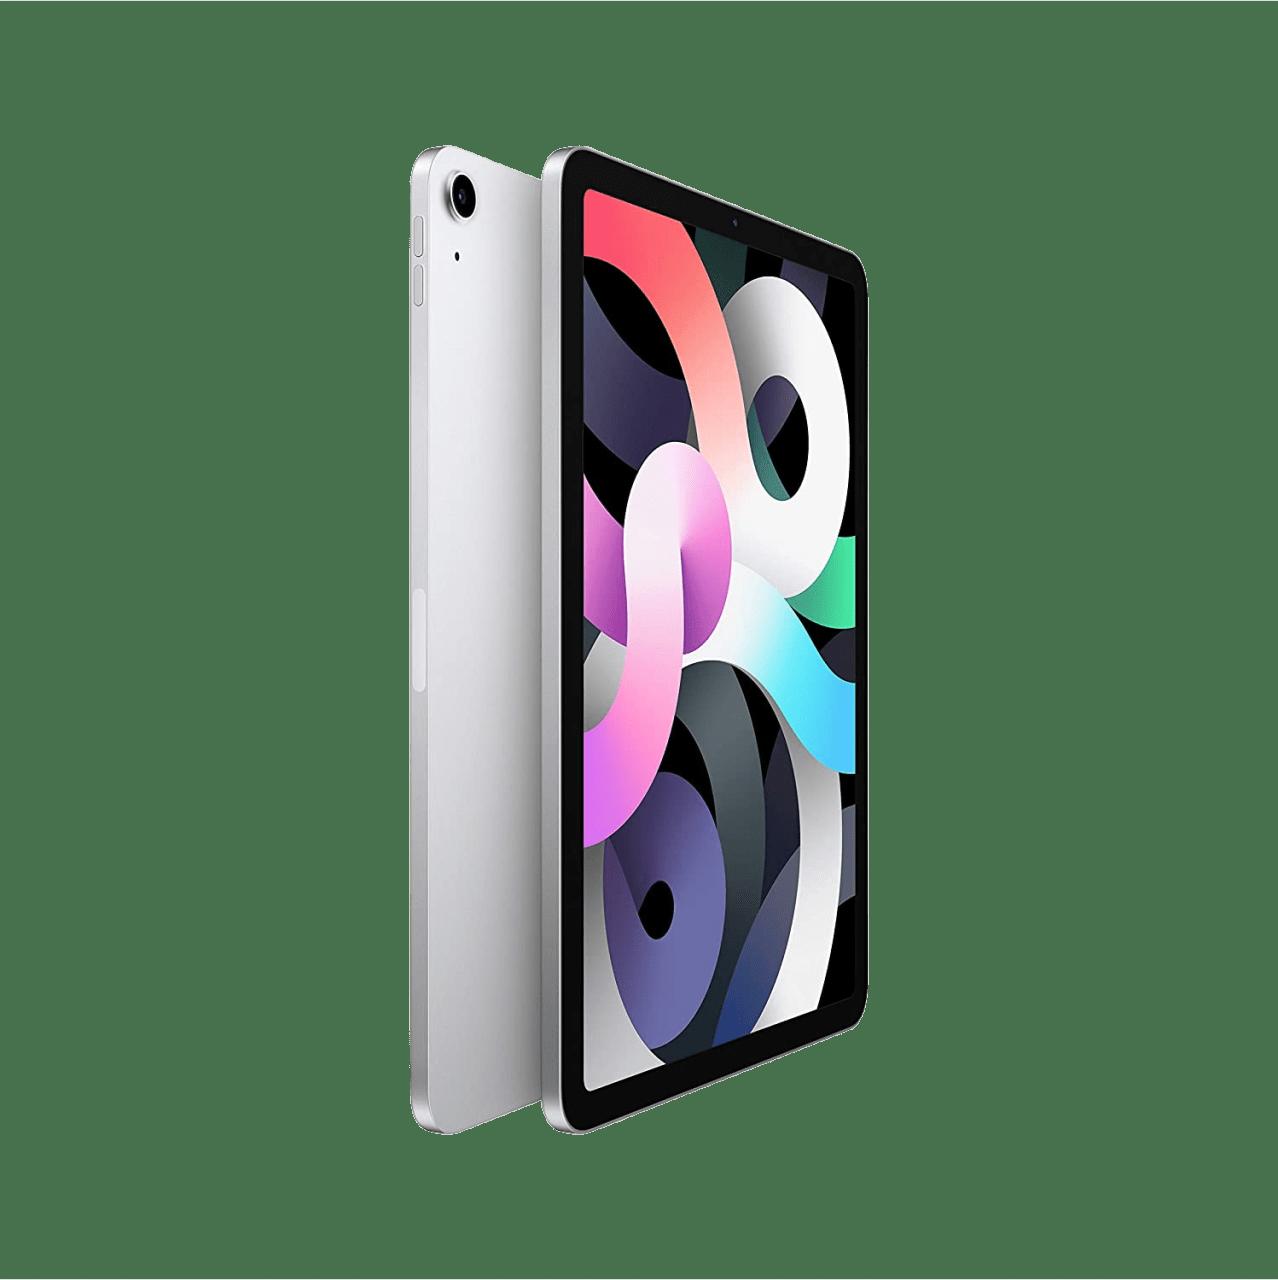 Silber Apple iPad Air WiFi 64GB (2020).2